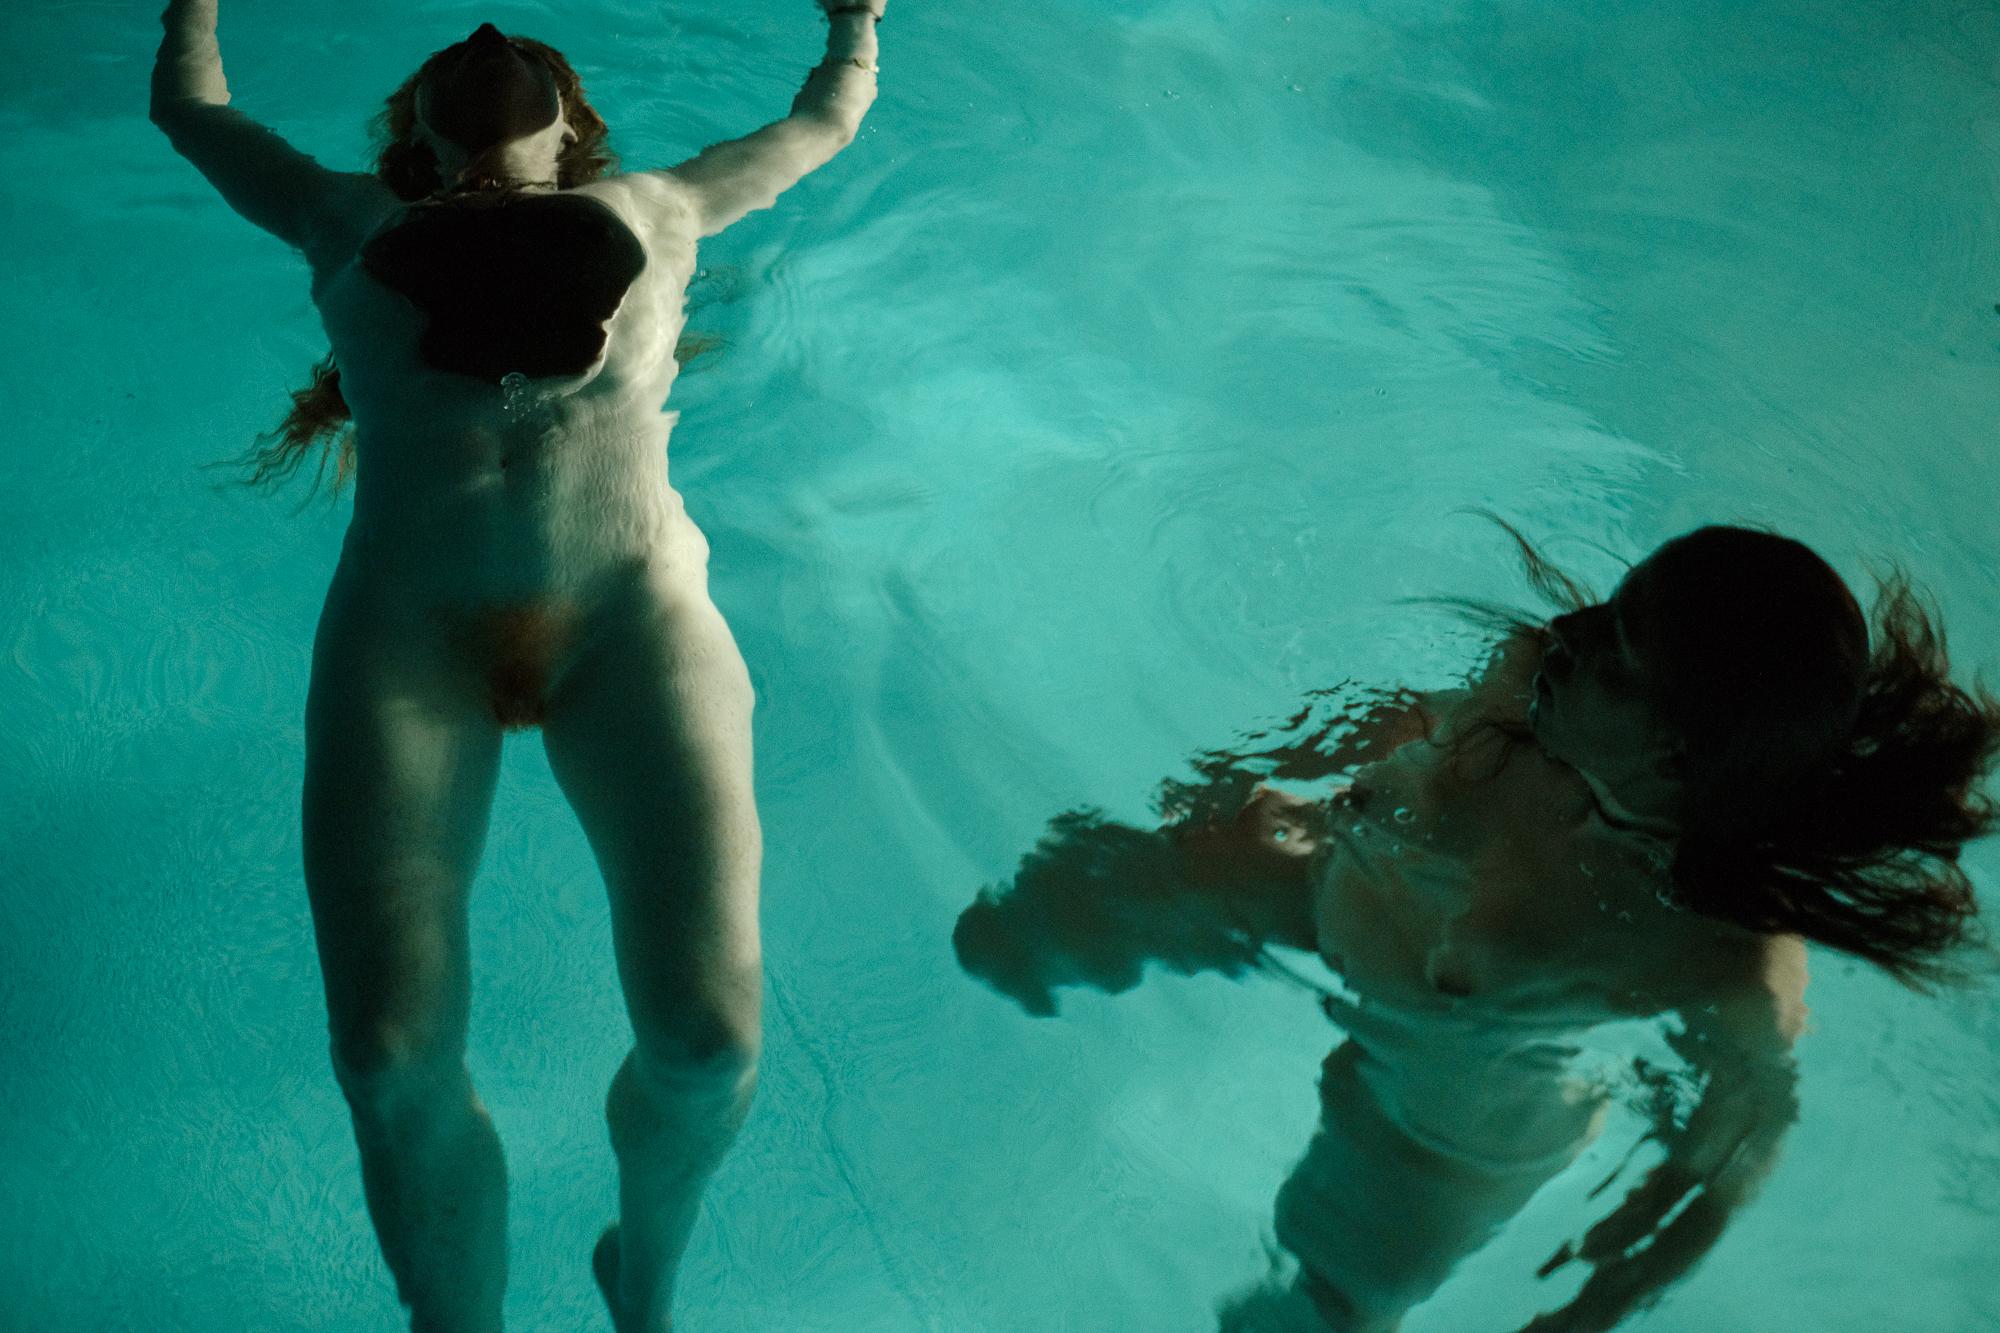 20170619-Ariane-Cassidy-Hannah-swimming-pool-X-Pro2-0158-Edit.jpg